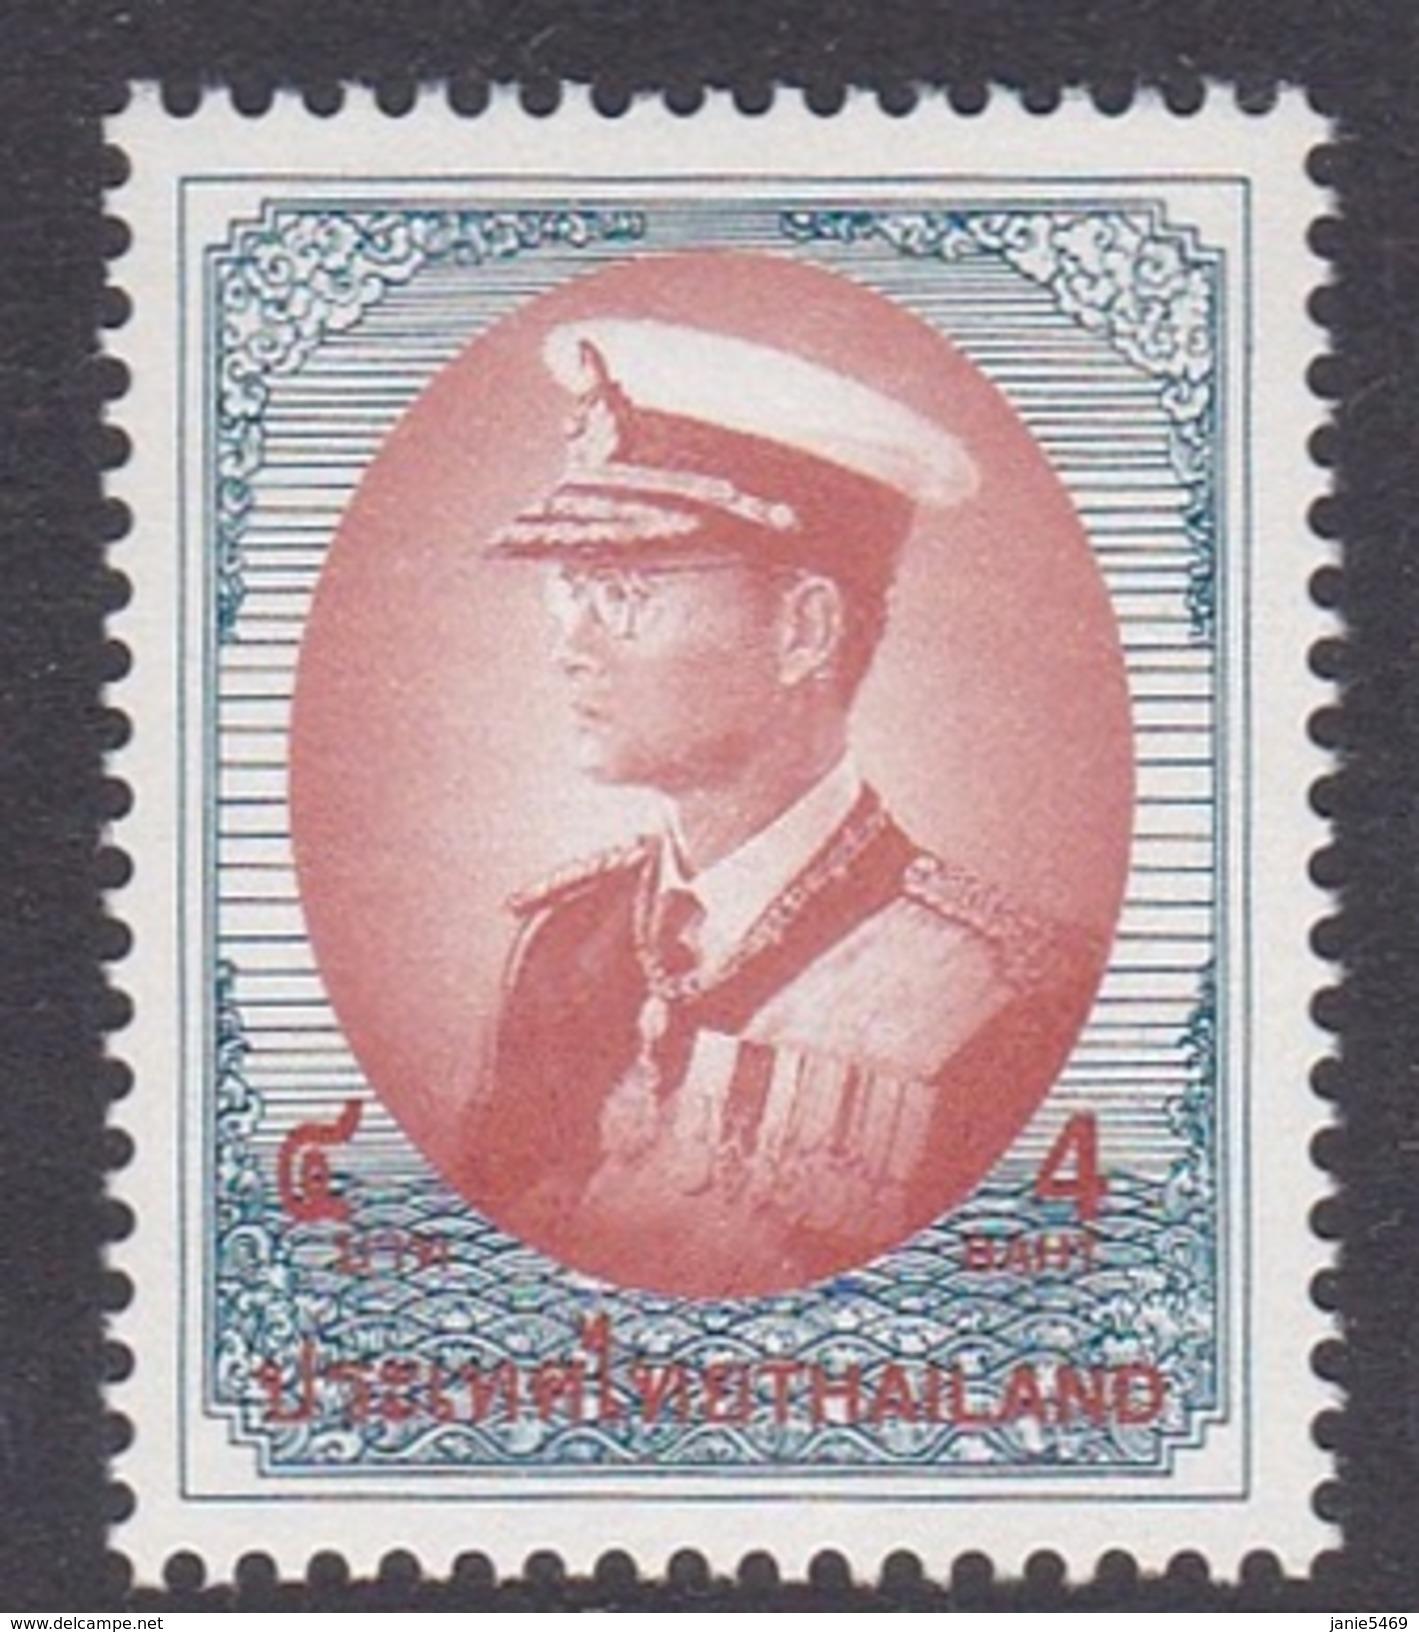 Thailand Scott 1725b 2000 King Rama IX 4 Baht MNH - Thailand